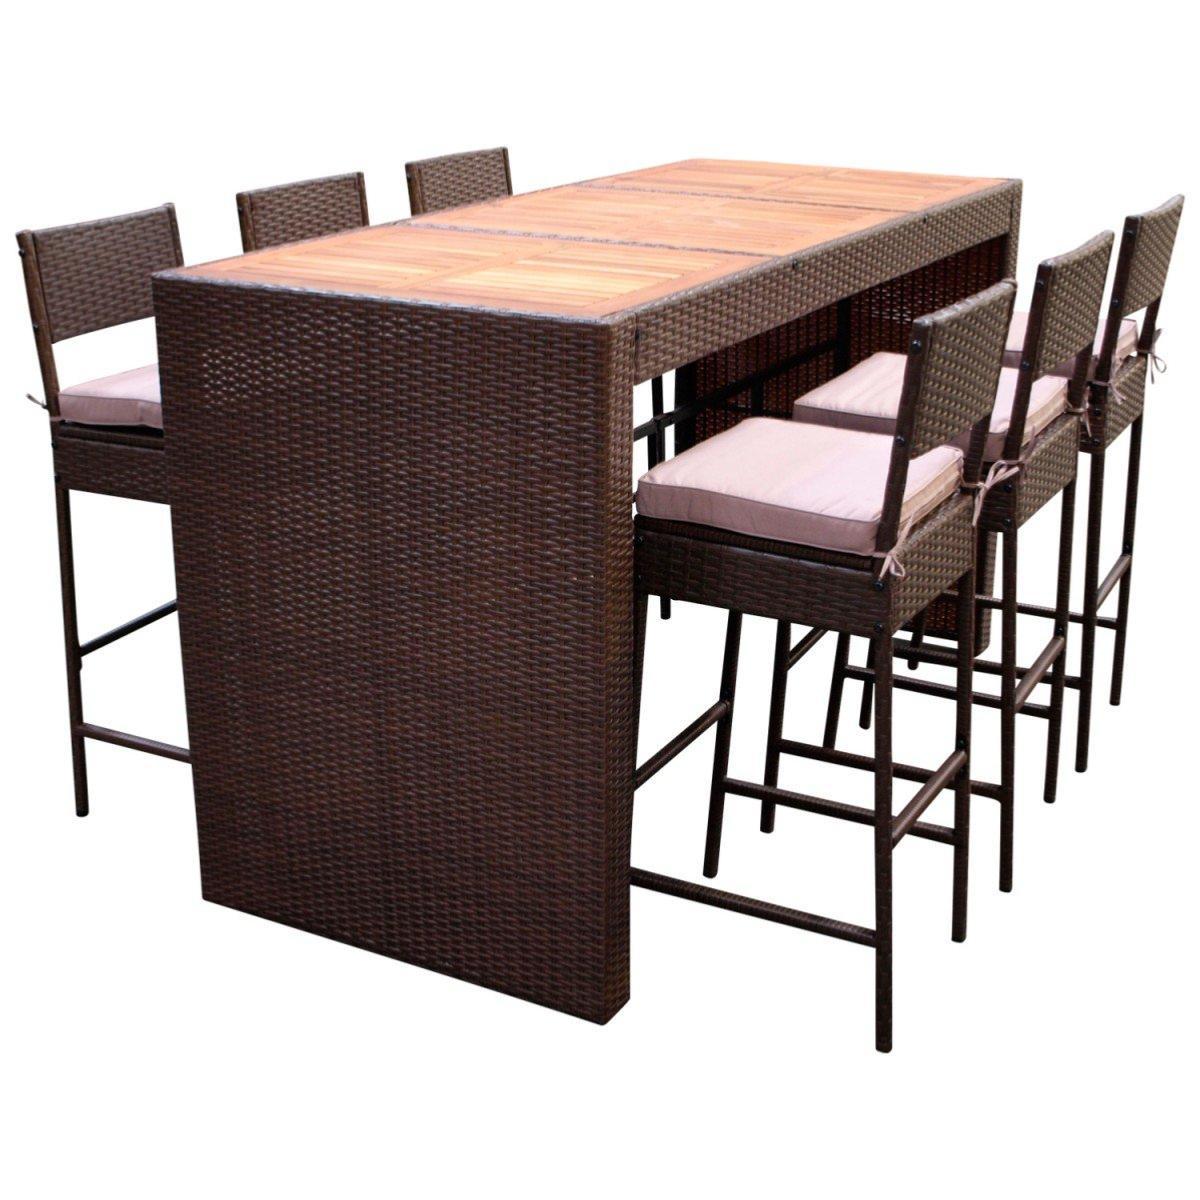 Bar de jardin r sine tress e marron et acacia 6 fauteuils - Tabouret de bar en resine tressee ...